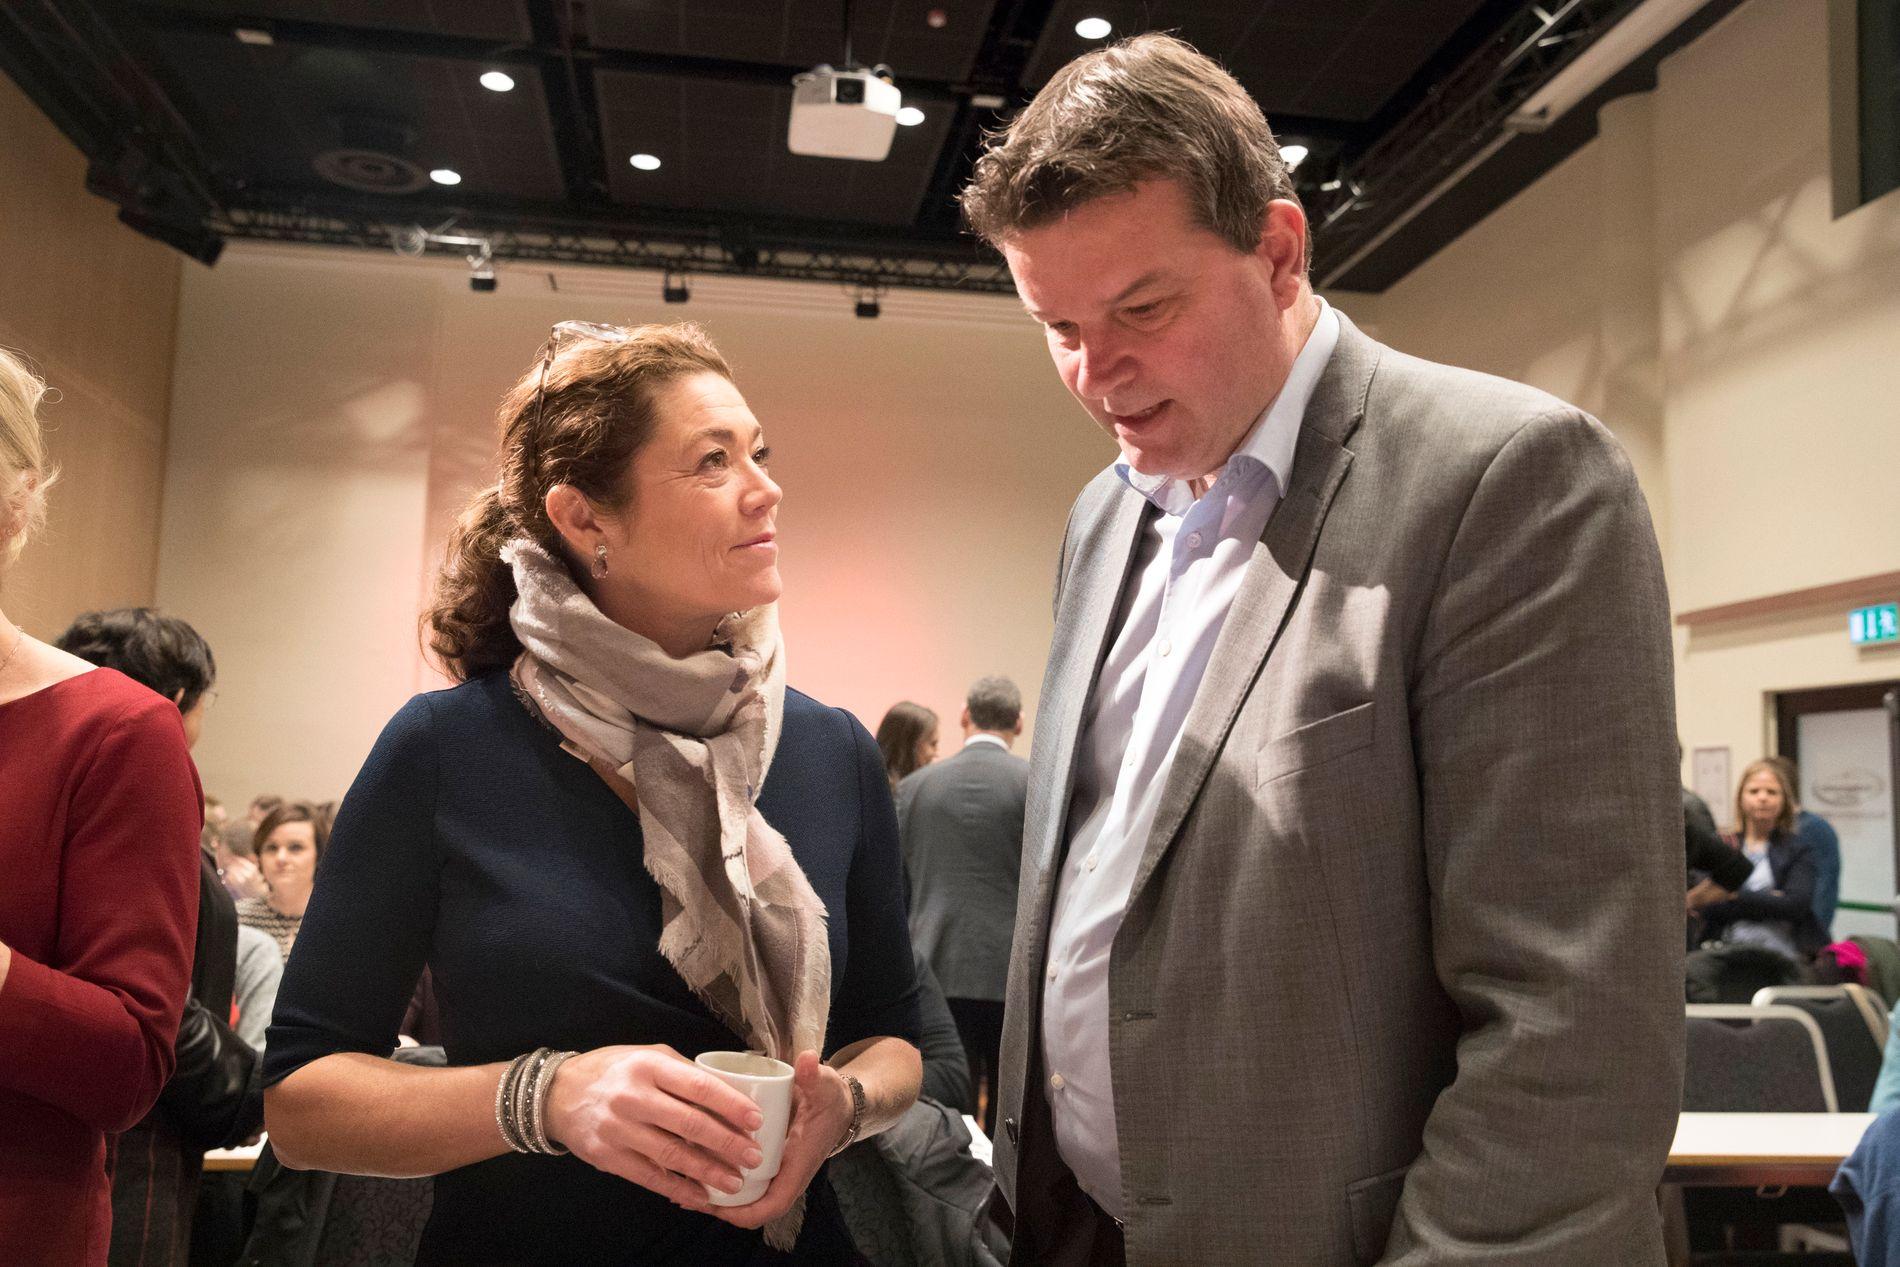 SKAL FORHANDLE: Det ligger at til at det blir NHO-sjef Kristin Skogen-Lund og LO-sjef Hans Christian Gabrielsen som skal forhandle i årets hovedoppgjør i privat sektor. Men det har sittet langt inne.